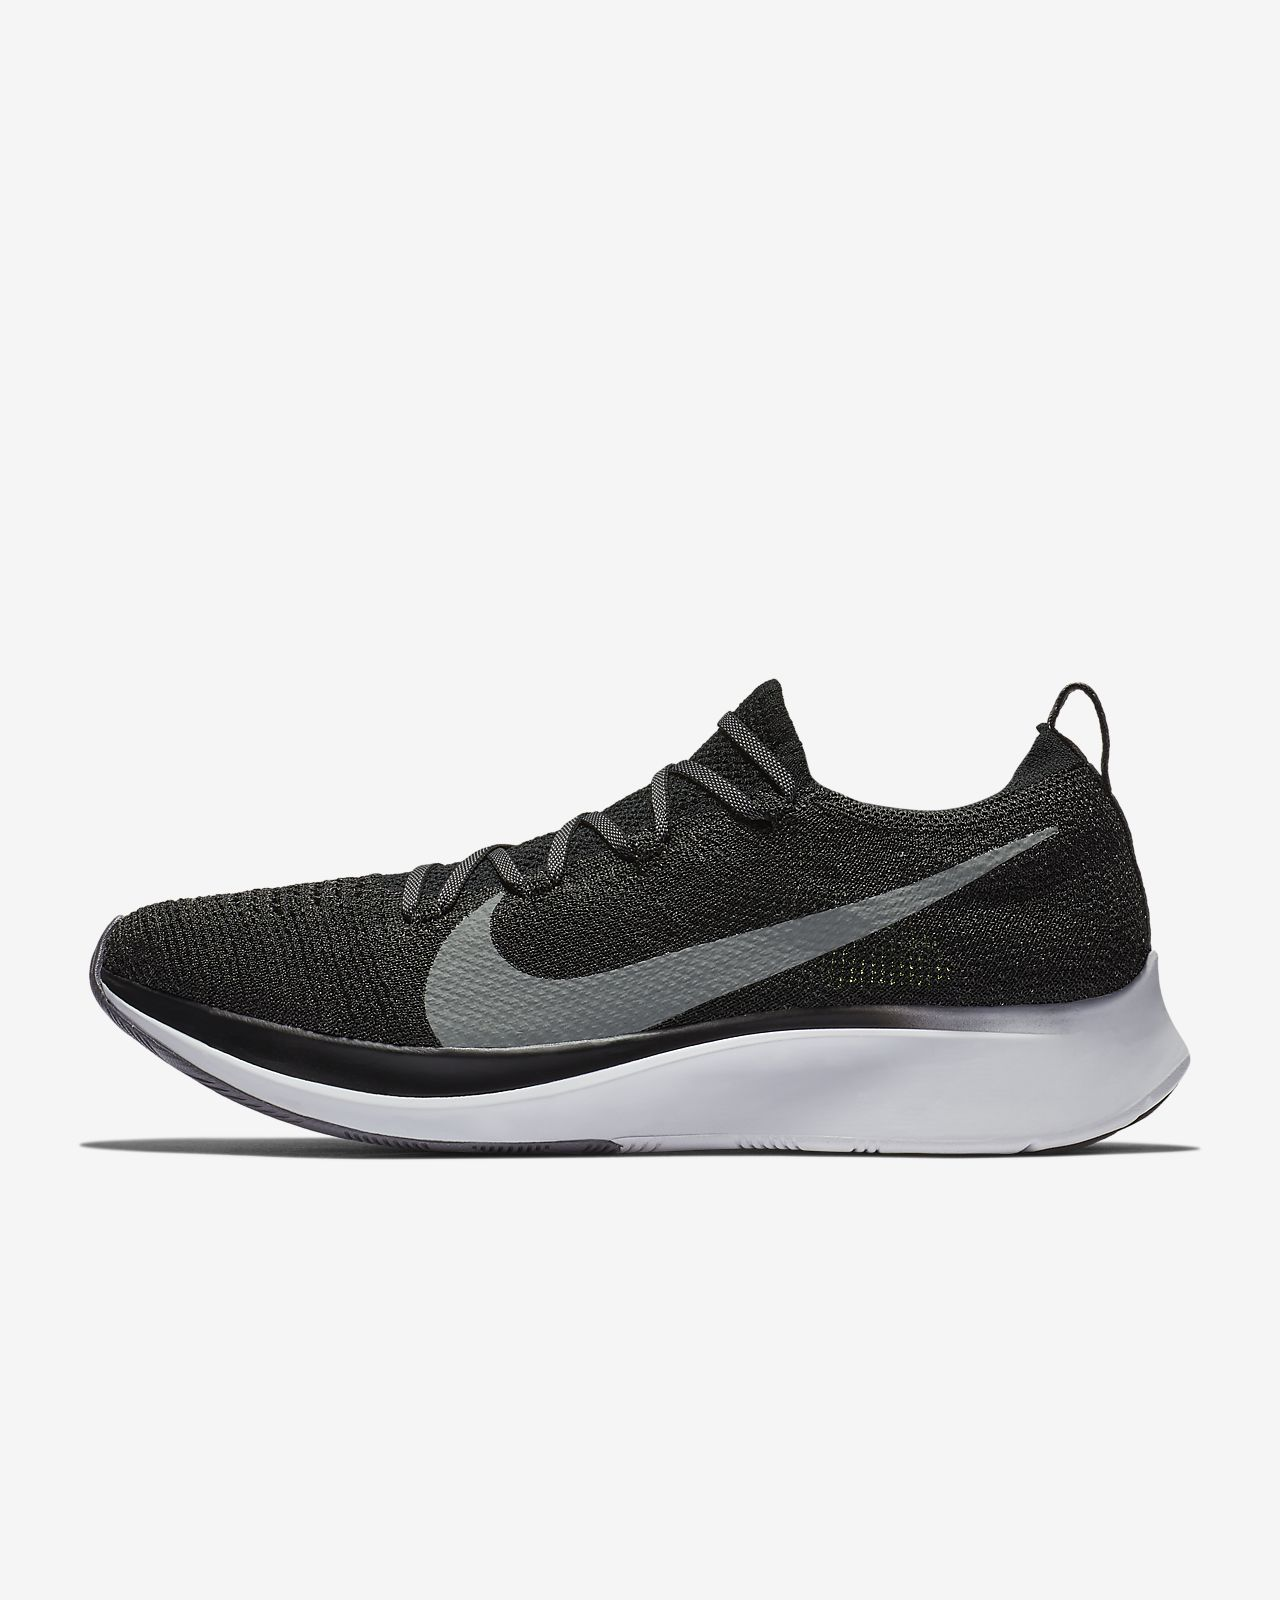 fe64116fa3d732 Nike Zoom Fly Flyknit Men s Running Shoe. Nike.com AT